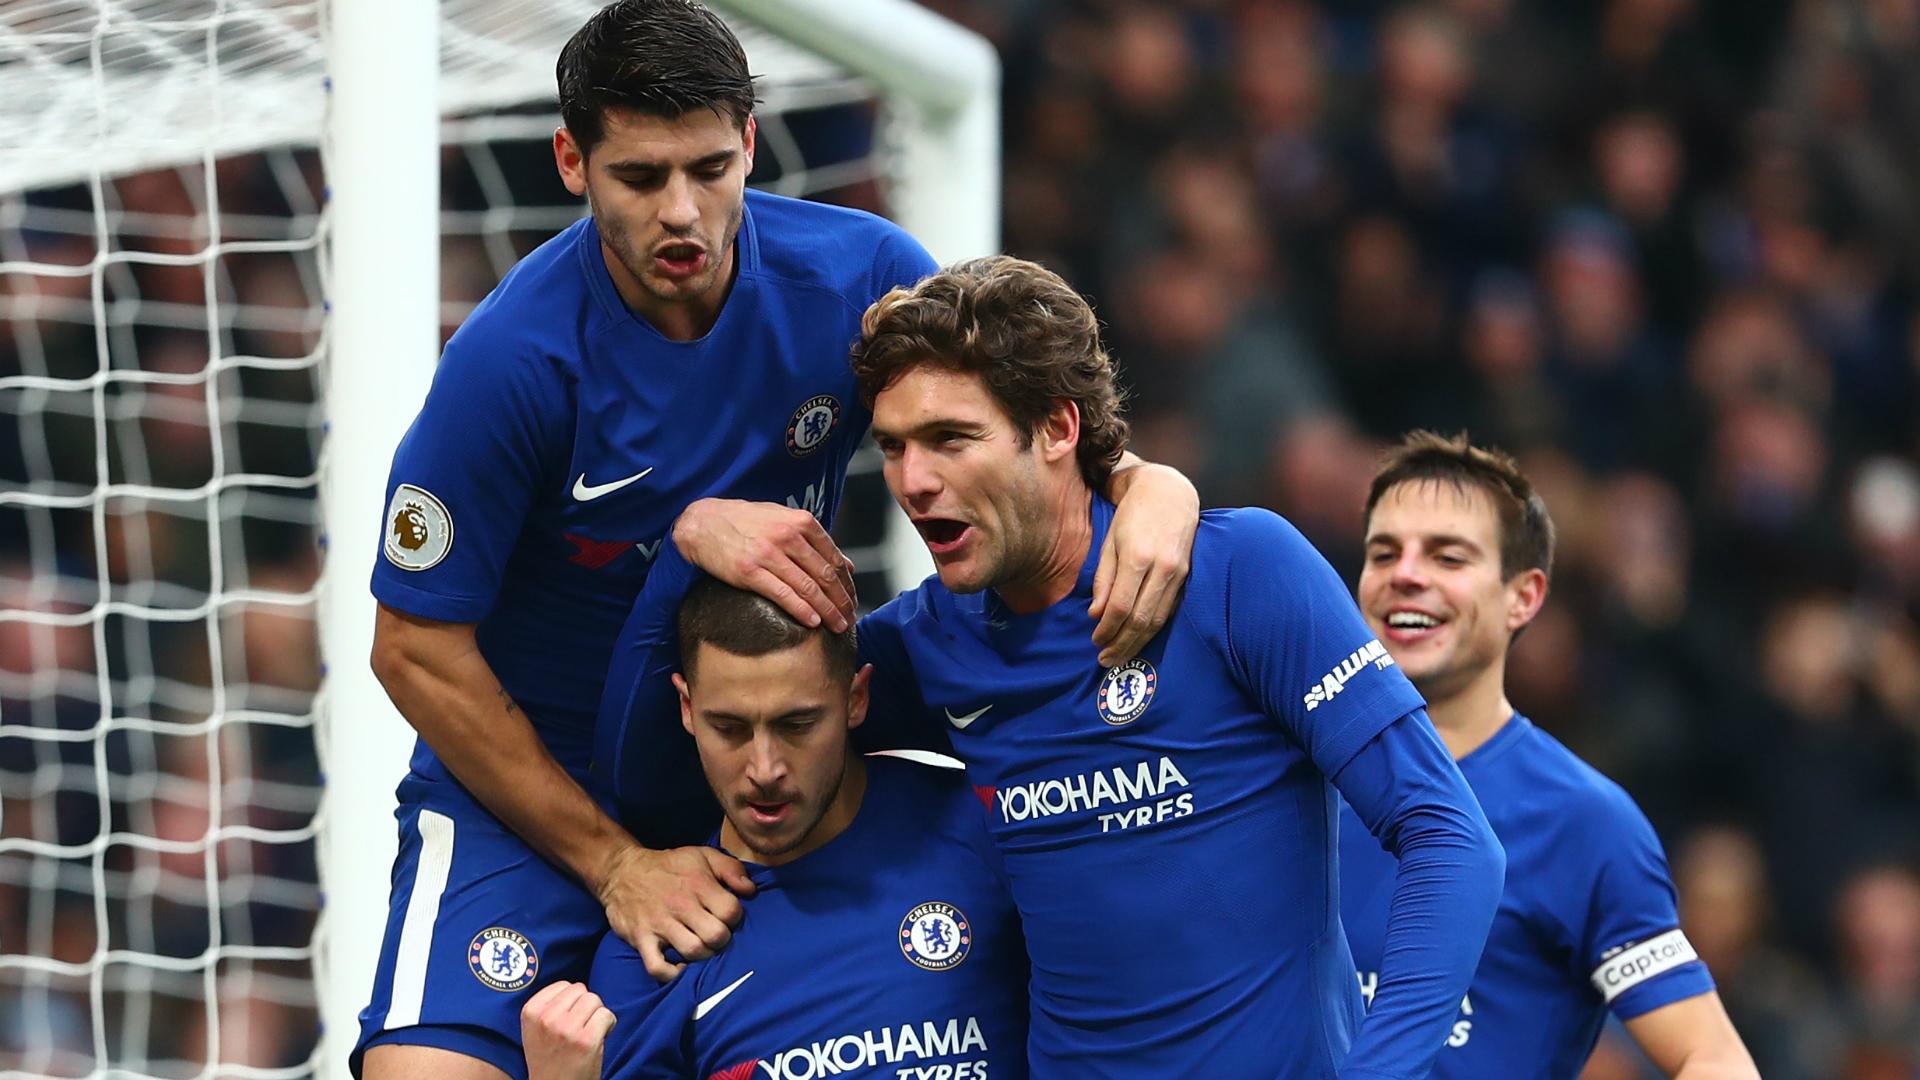 Chelsea - Newcastle: Chelsea players celebrate Hazard's brace